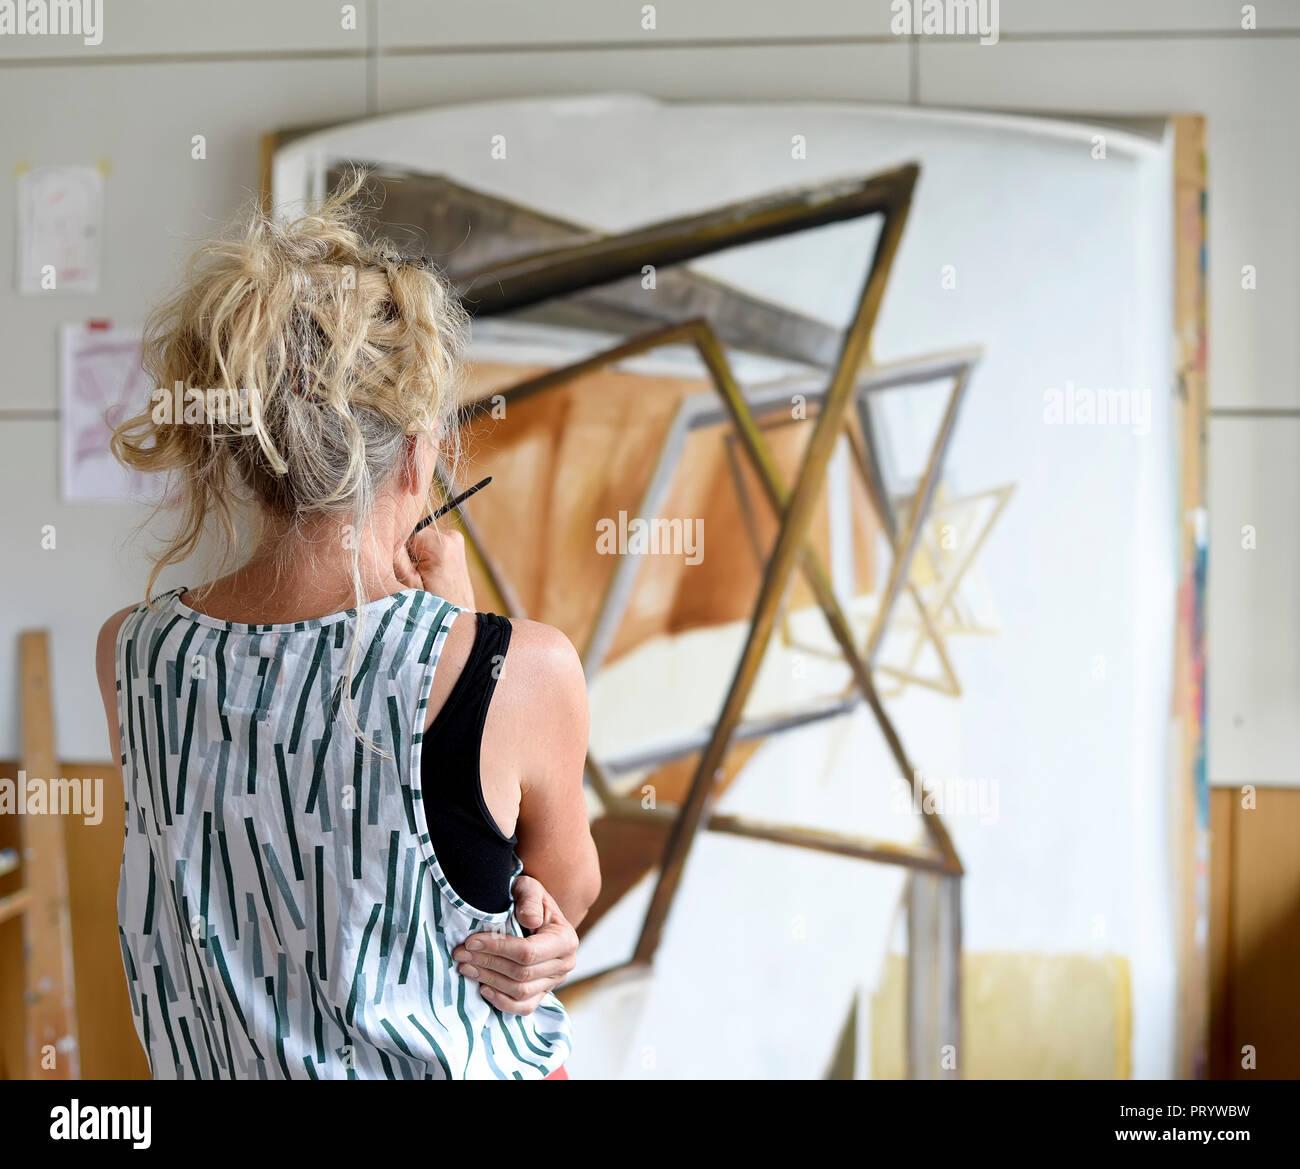 Toile Dans L Atelier Malerei Von Hartiste Artmajeur